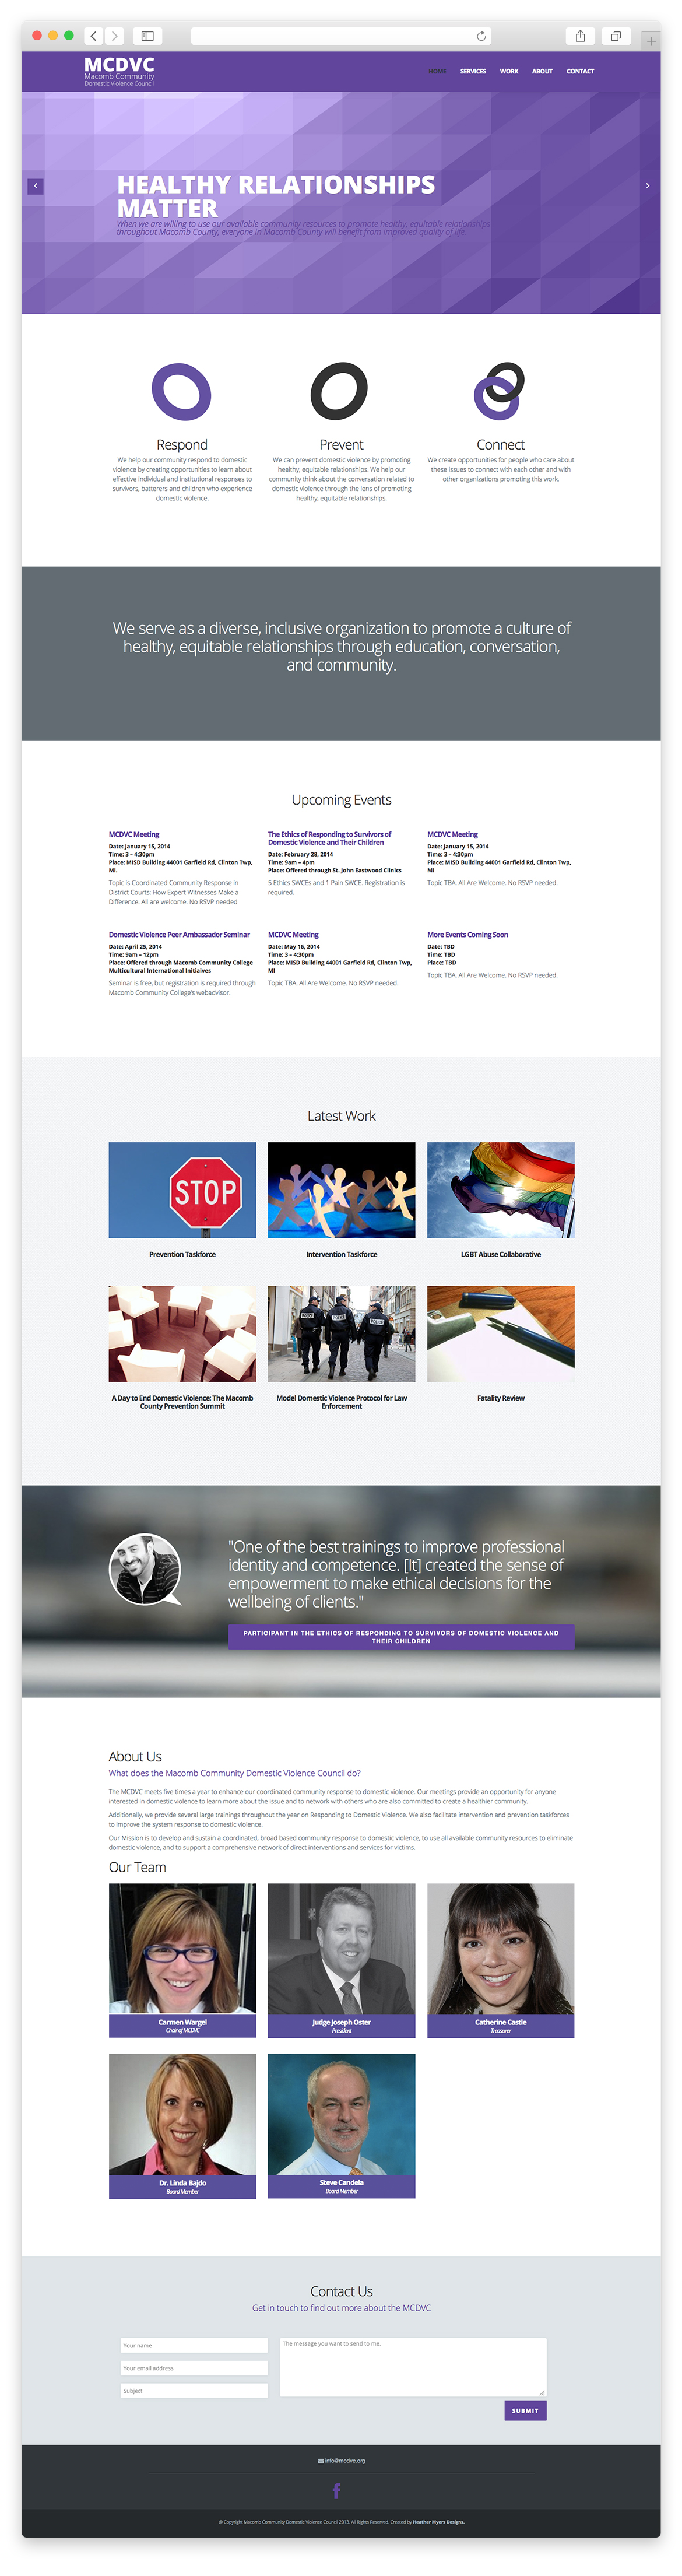 mcdvc-website